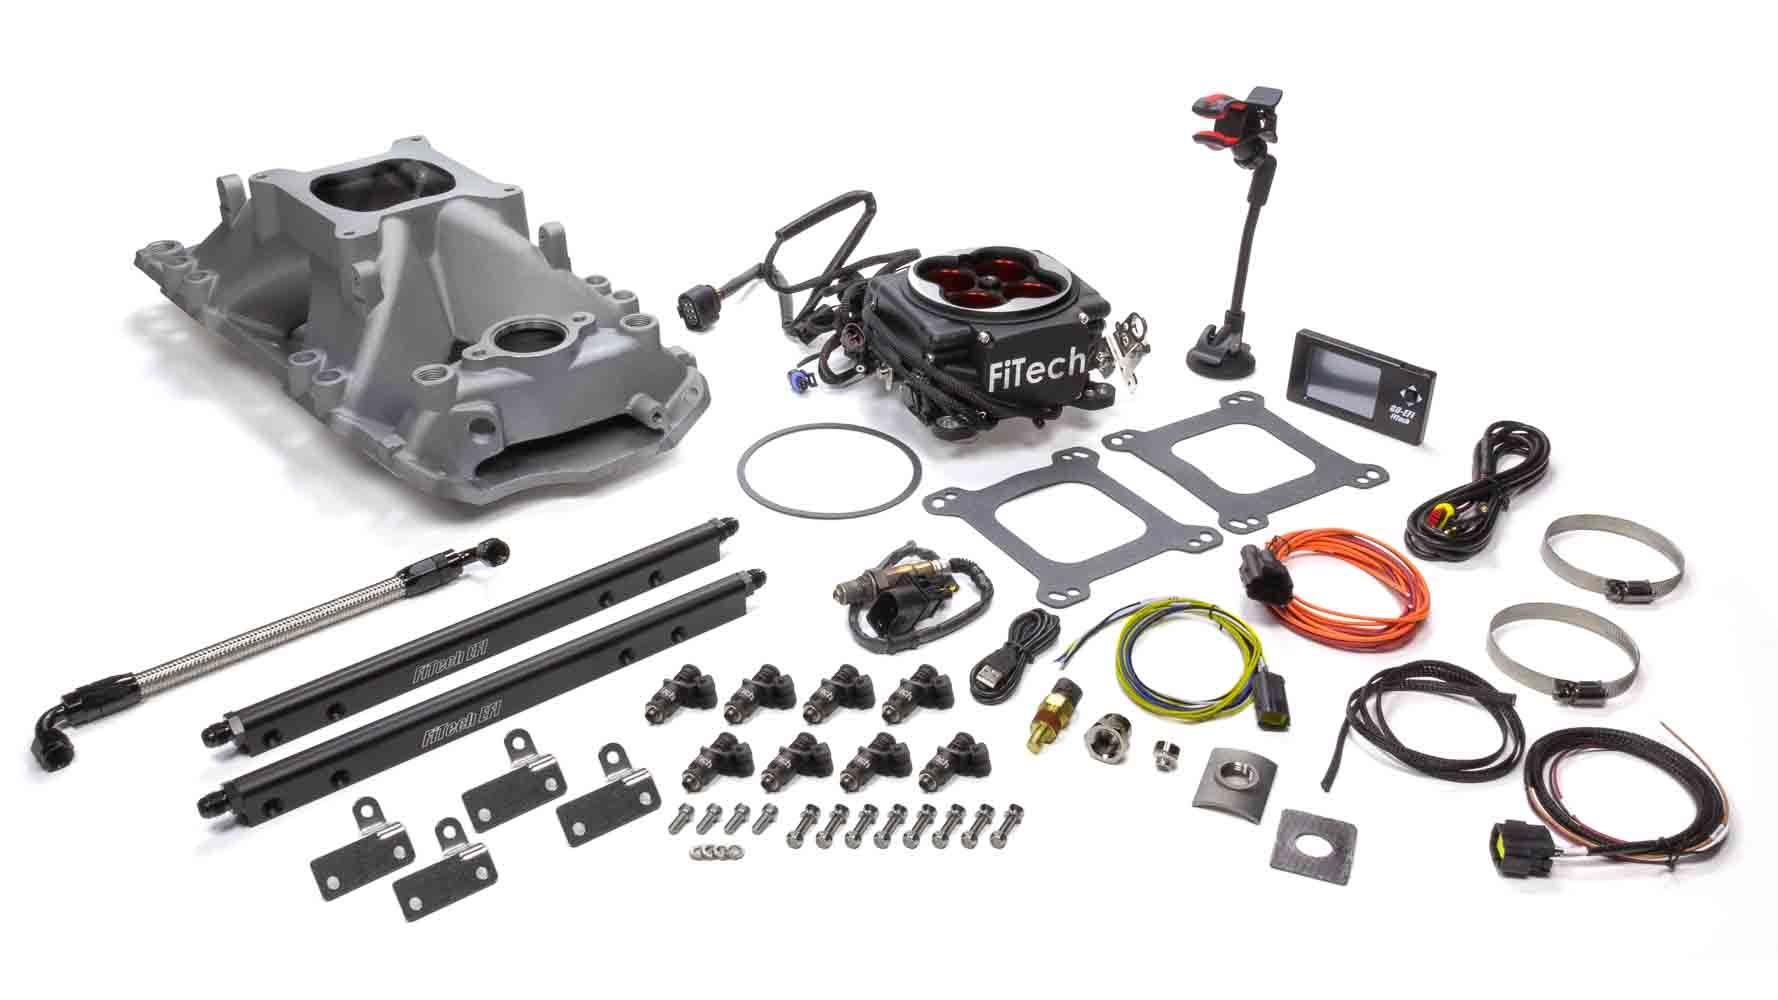 Fitech Fuel Injection Go Port SBC 200-550hp EFI System w/Black TB